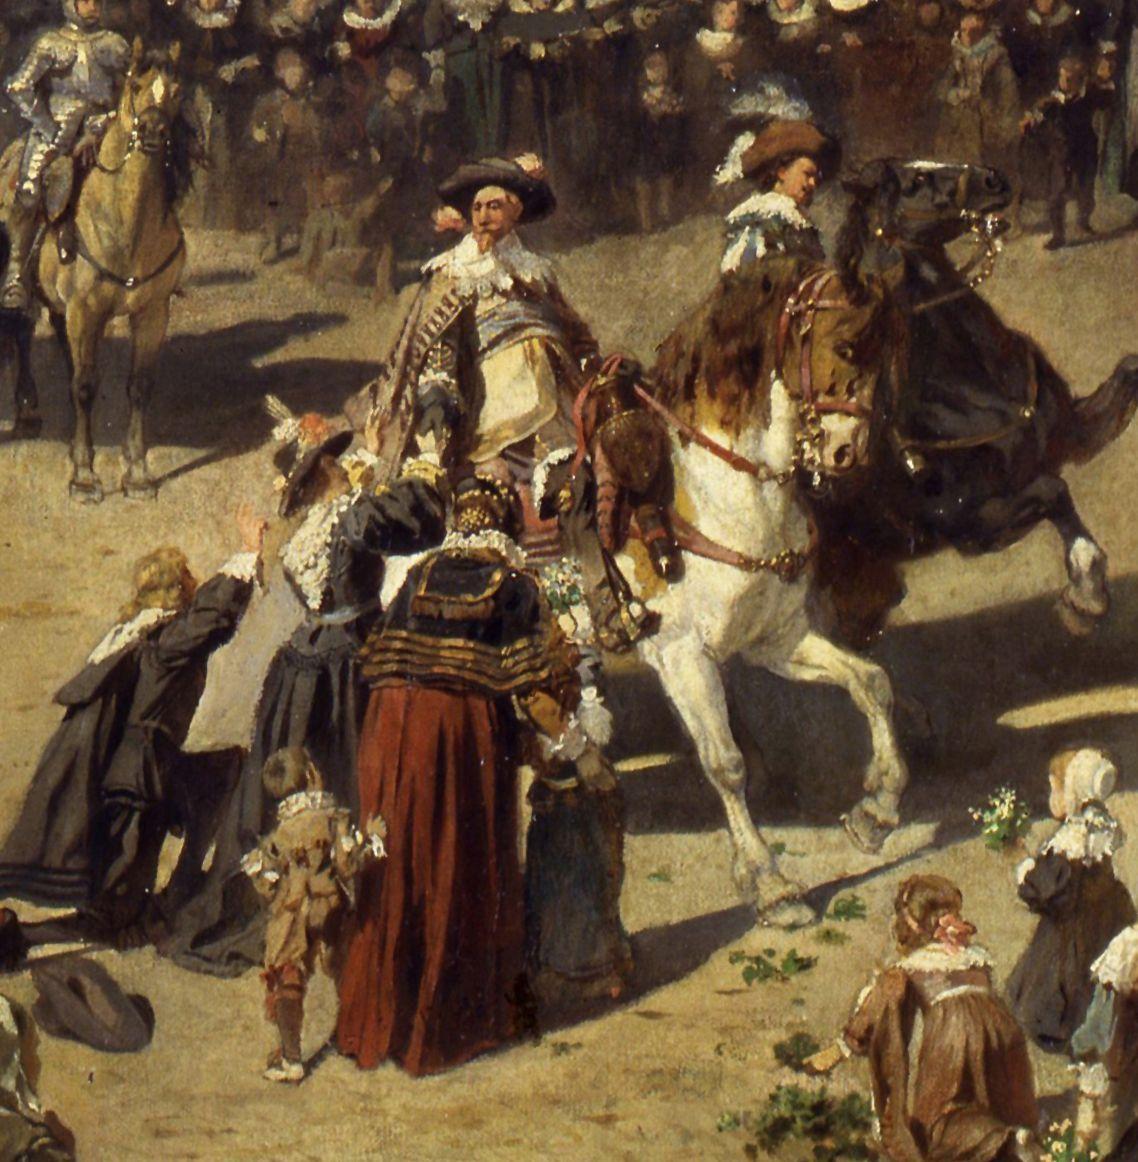 The old show at Nuremberg at the time of Gustav Adolf's entry on 21 March 1632. Gustav Adolf on horseback